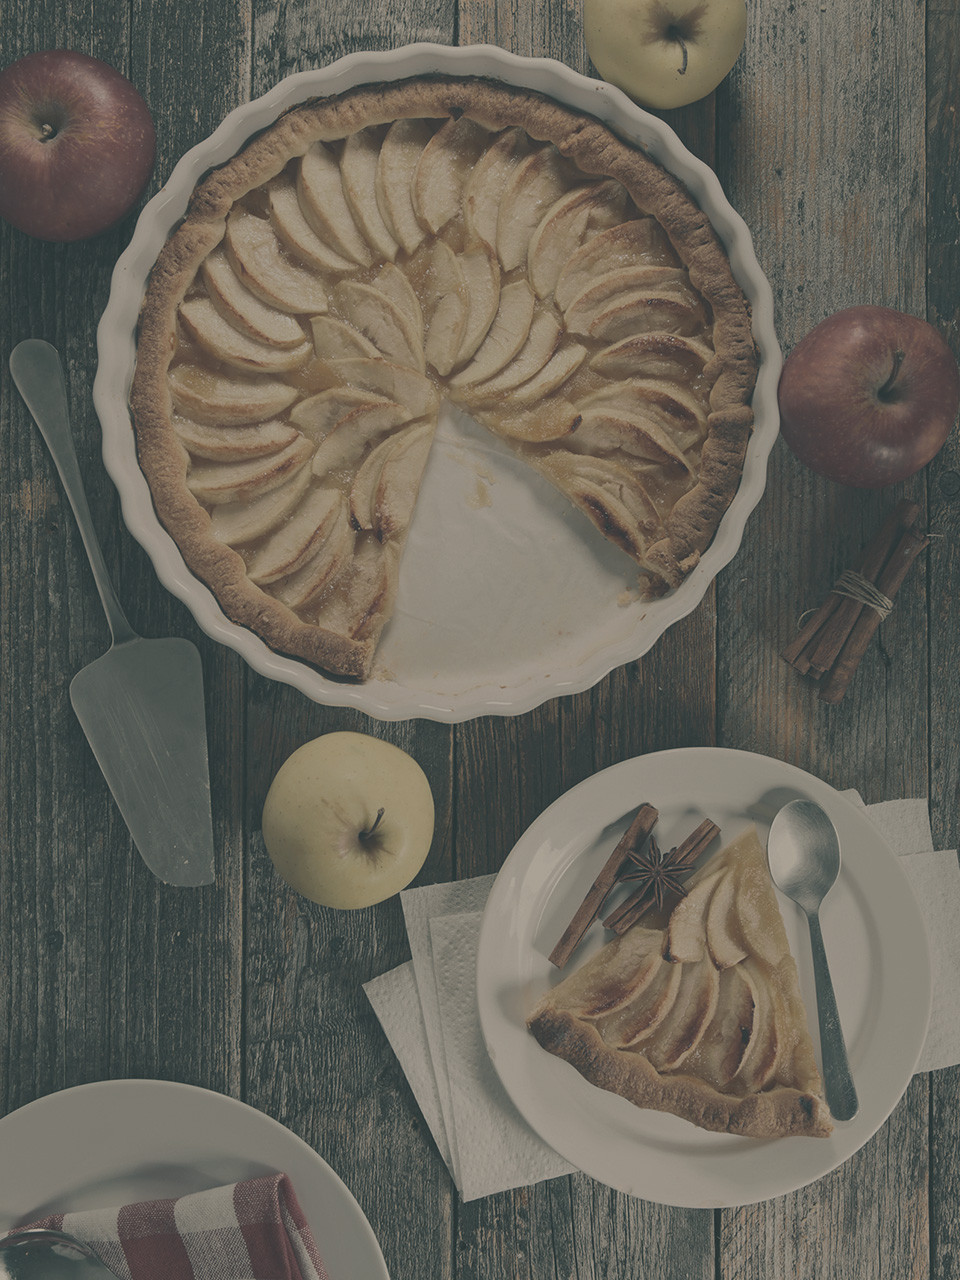 Sugar Free Desserts For Thanksgiving  Scrumptious Sugar free Thanksgiving Desserts